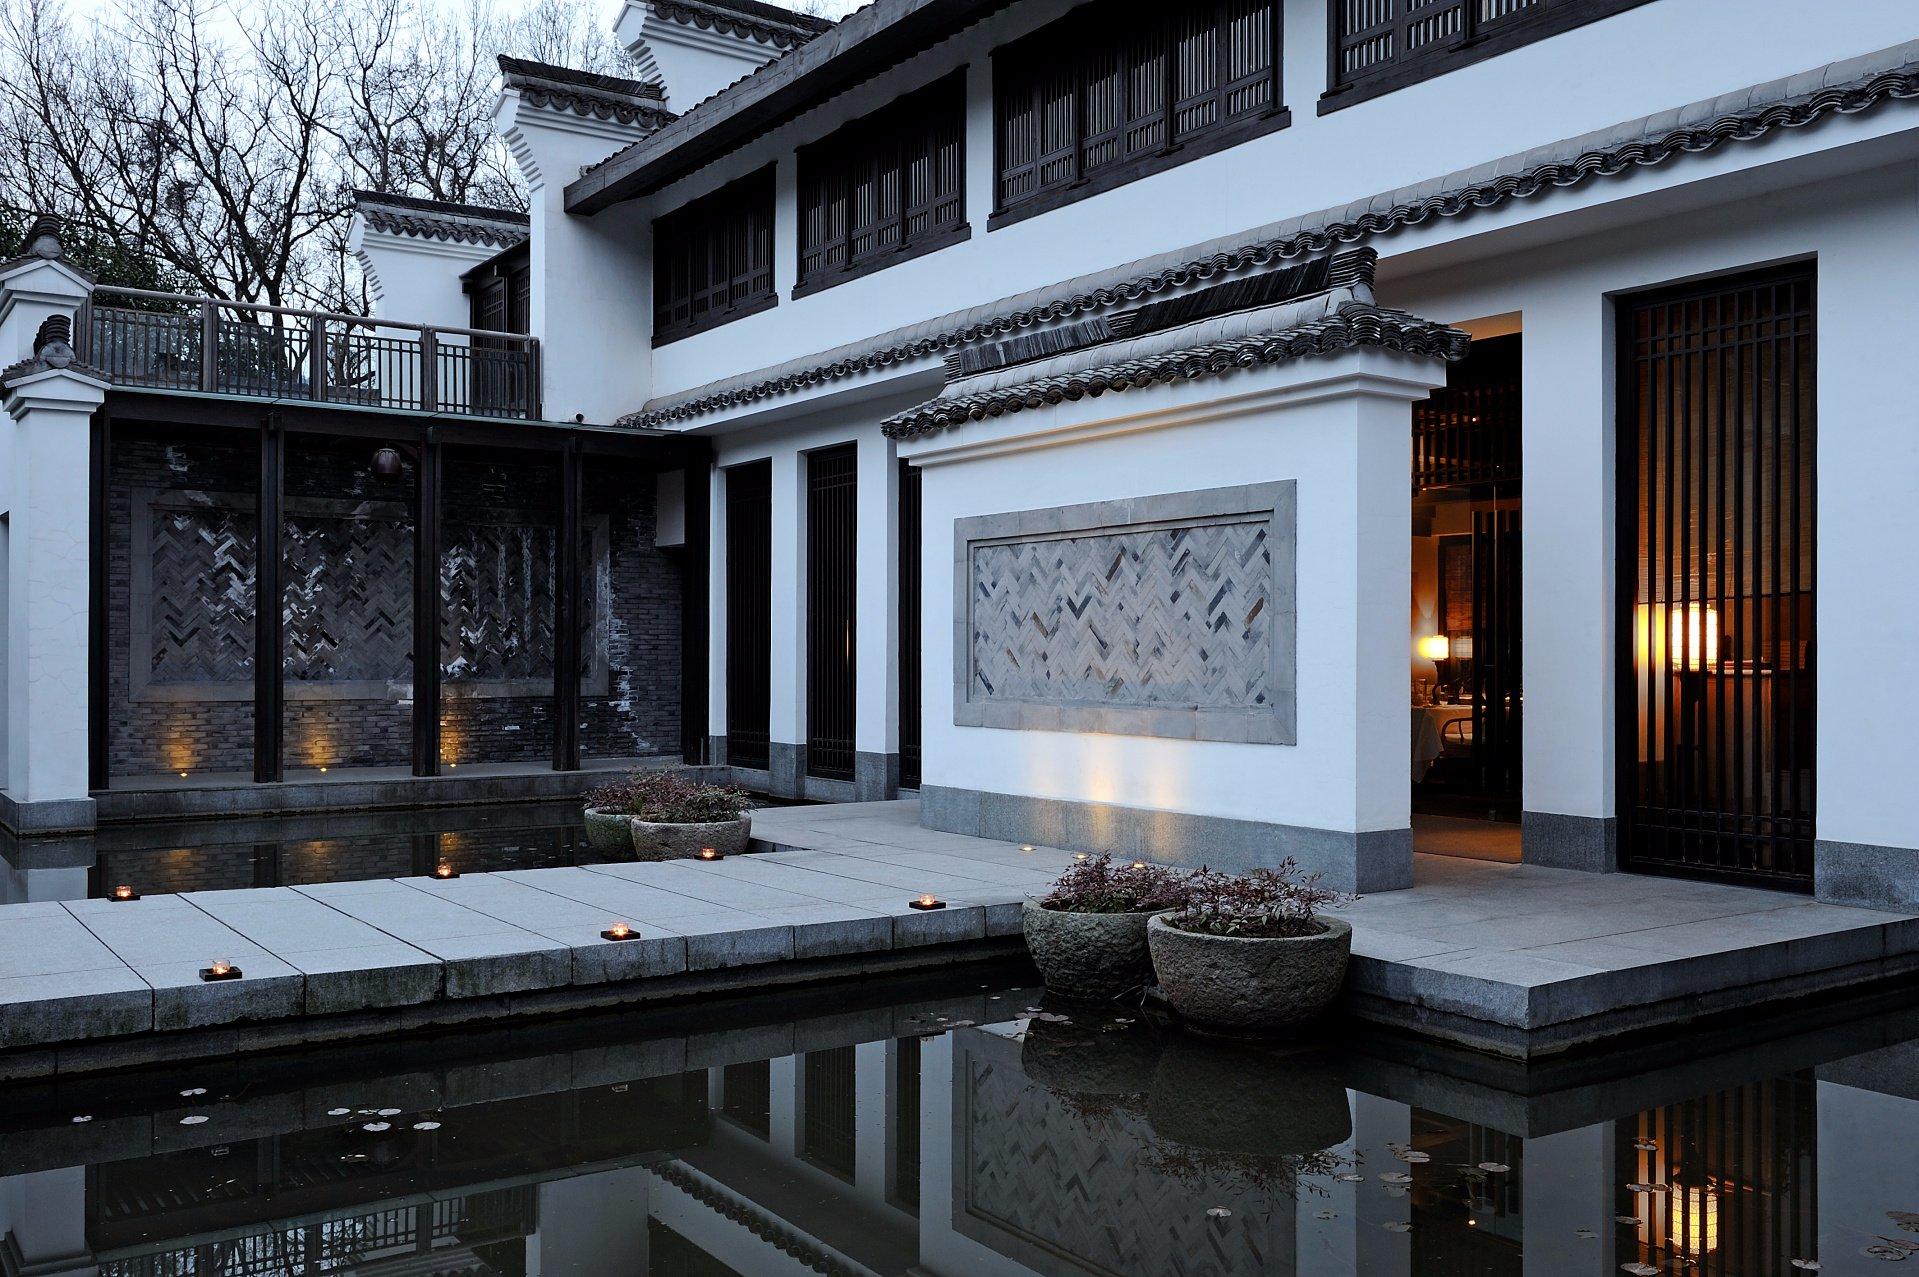 Hangzhou Amanfayun